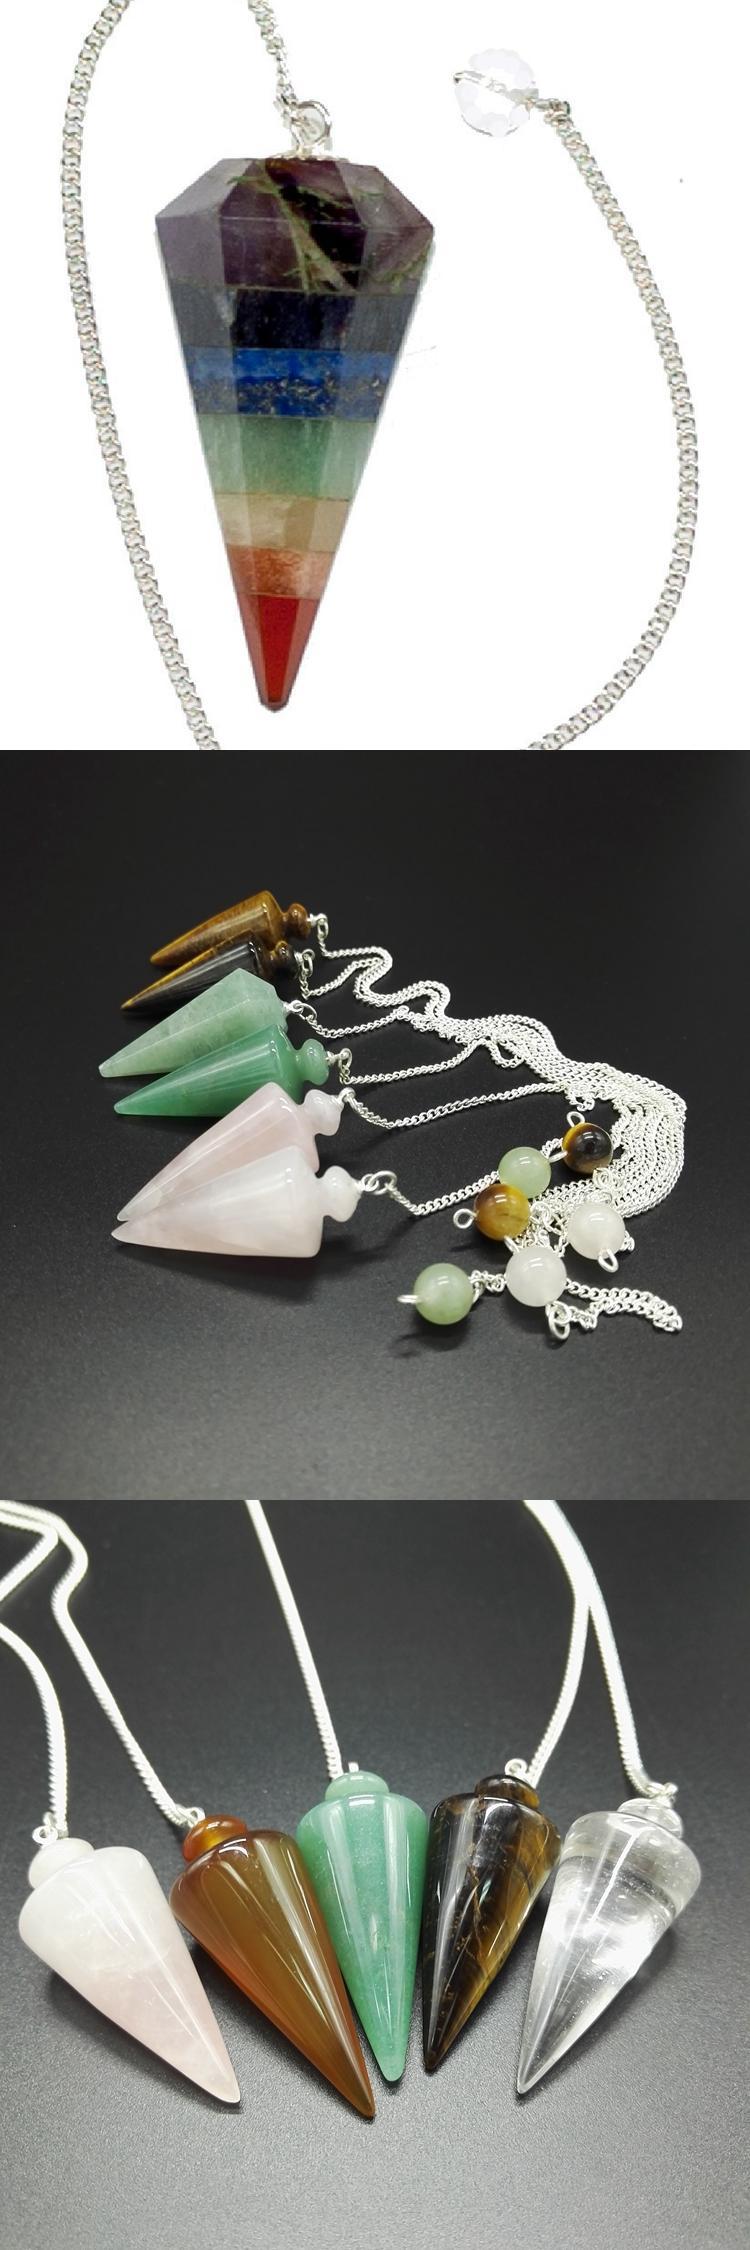 Gift set mixed gemstone pendulum crystal dowsing